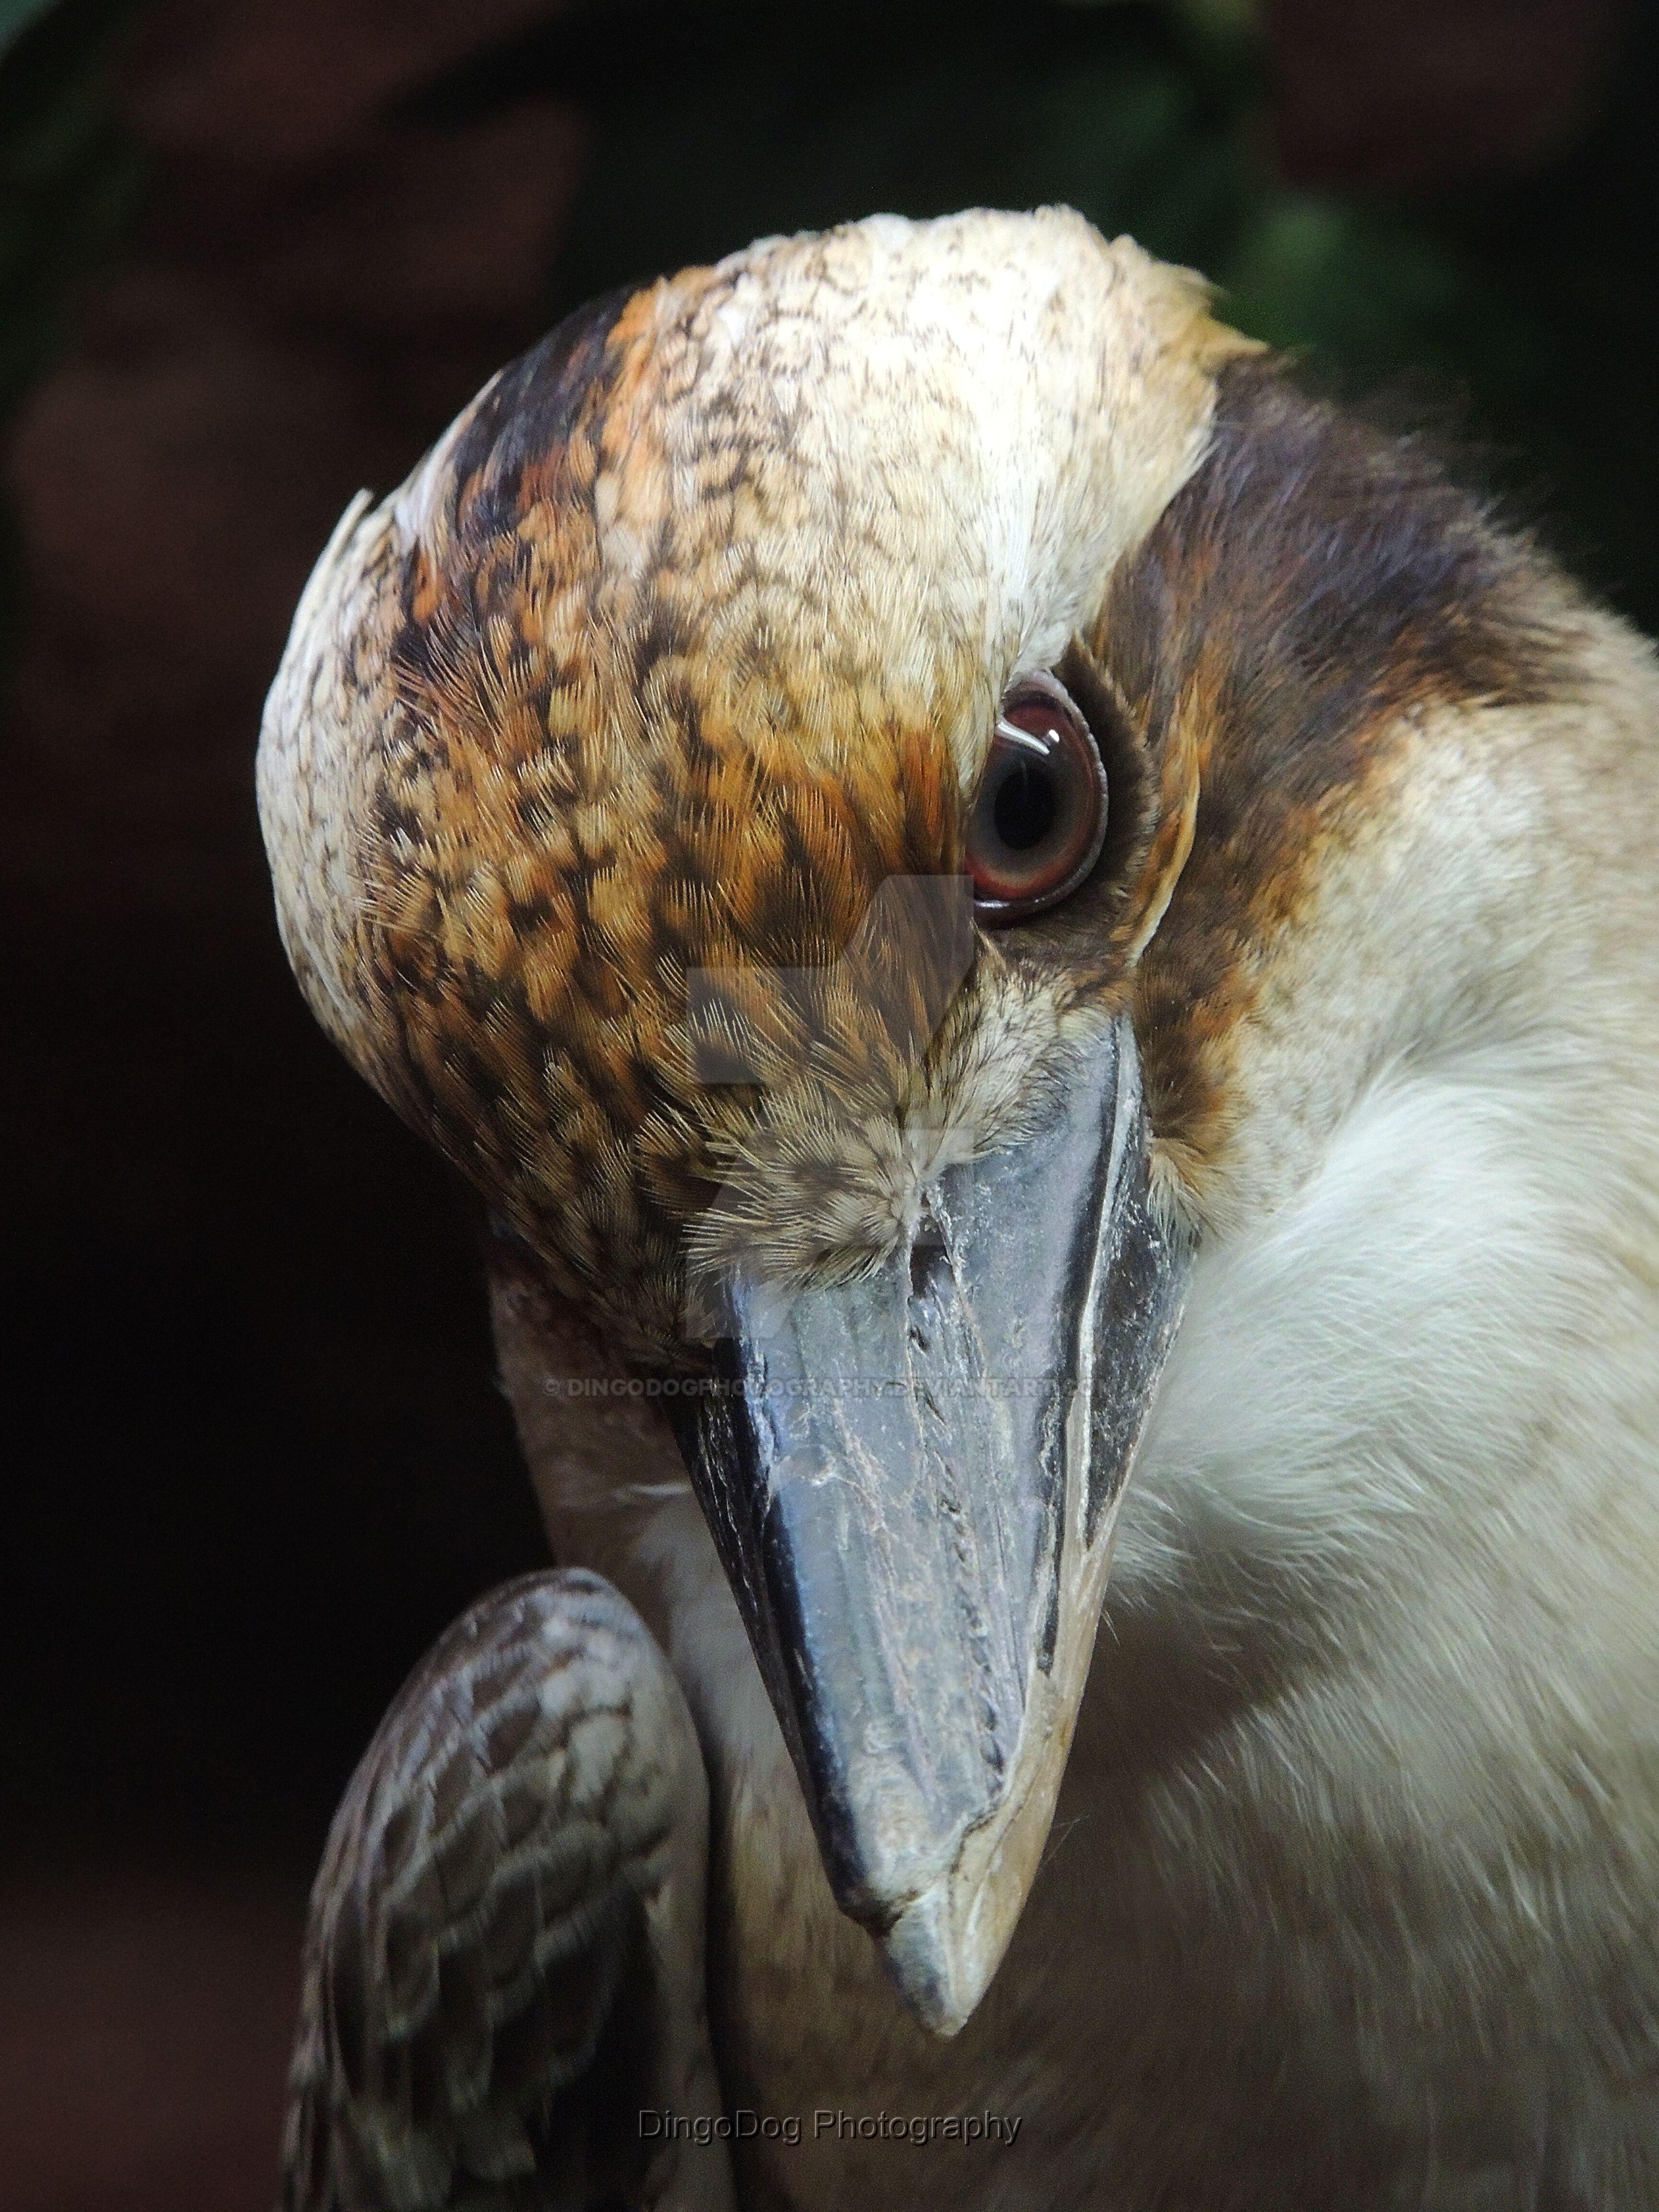 Australian Laughing Kookaburra by DingoDogPhotography